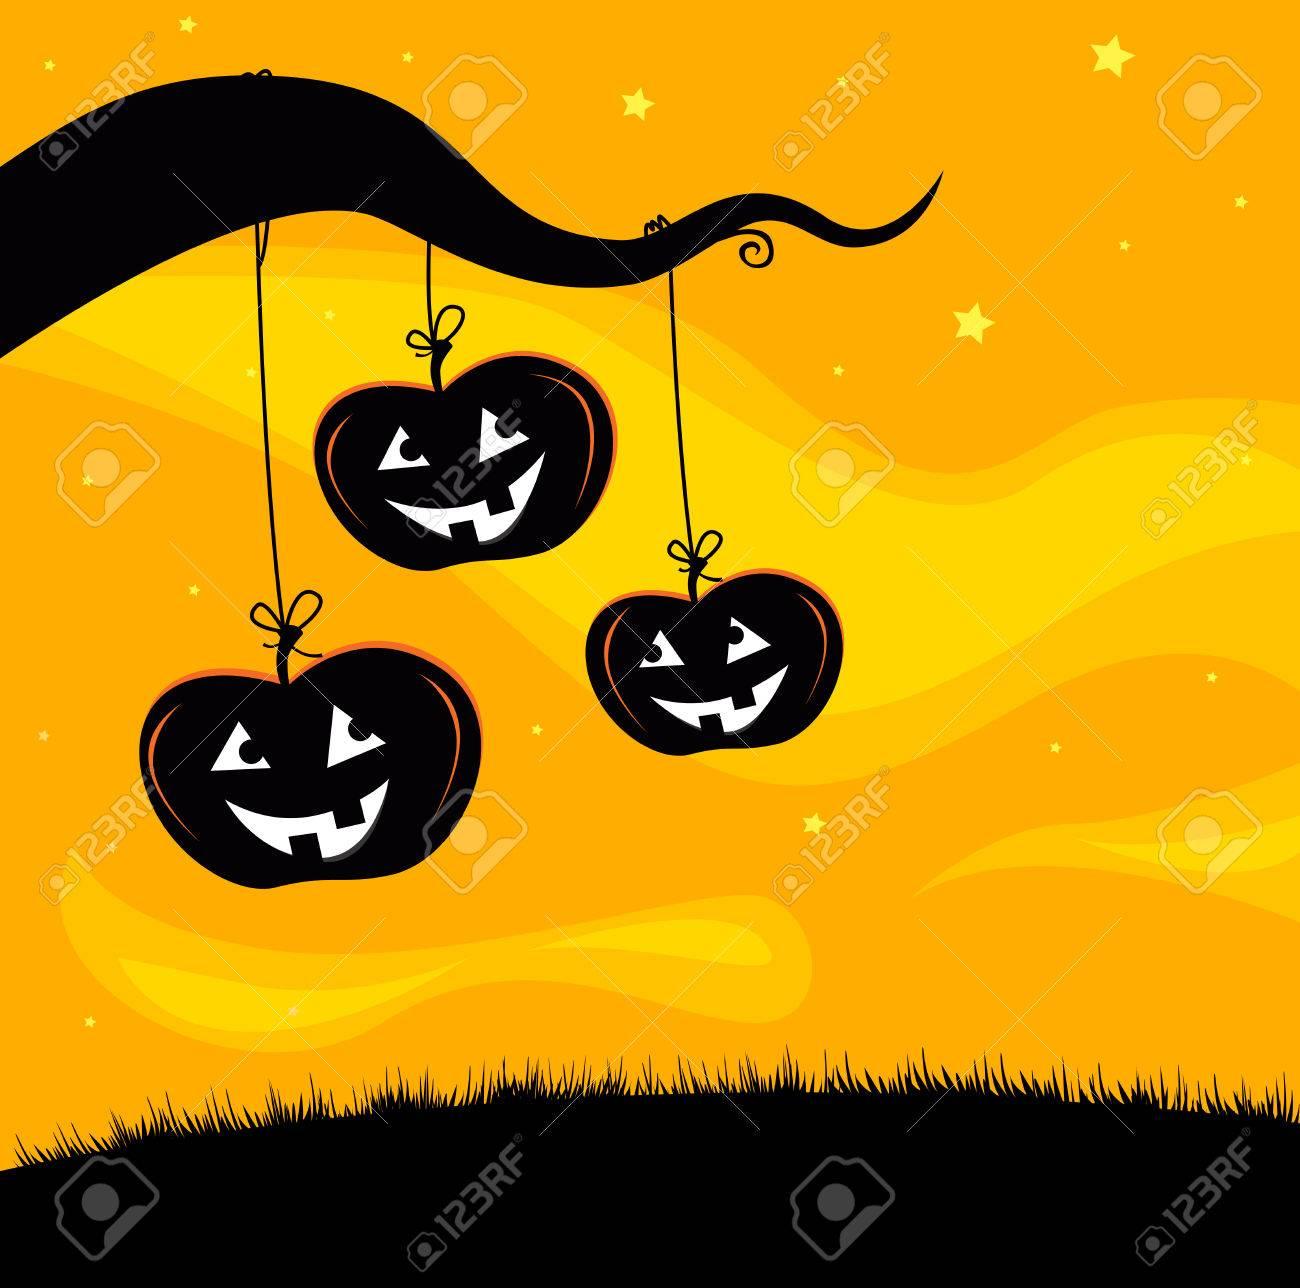 Halloween Jack O'Lantern Tree Stock Vector - 7852478